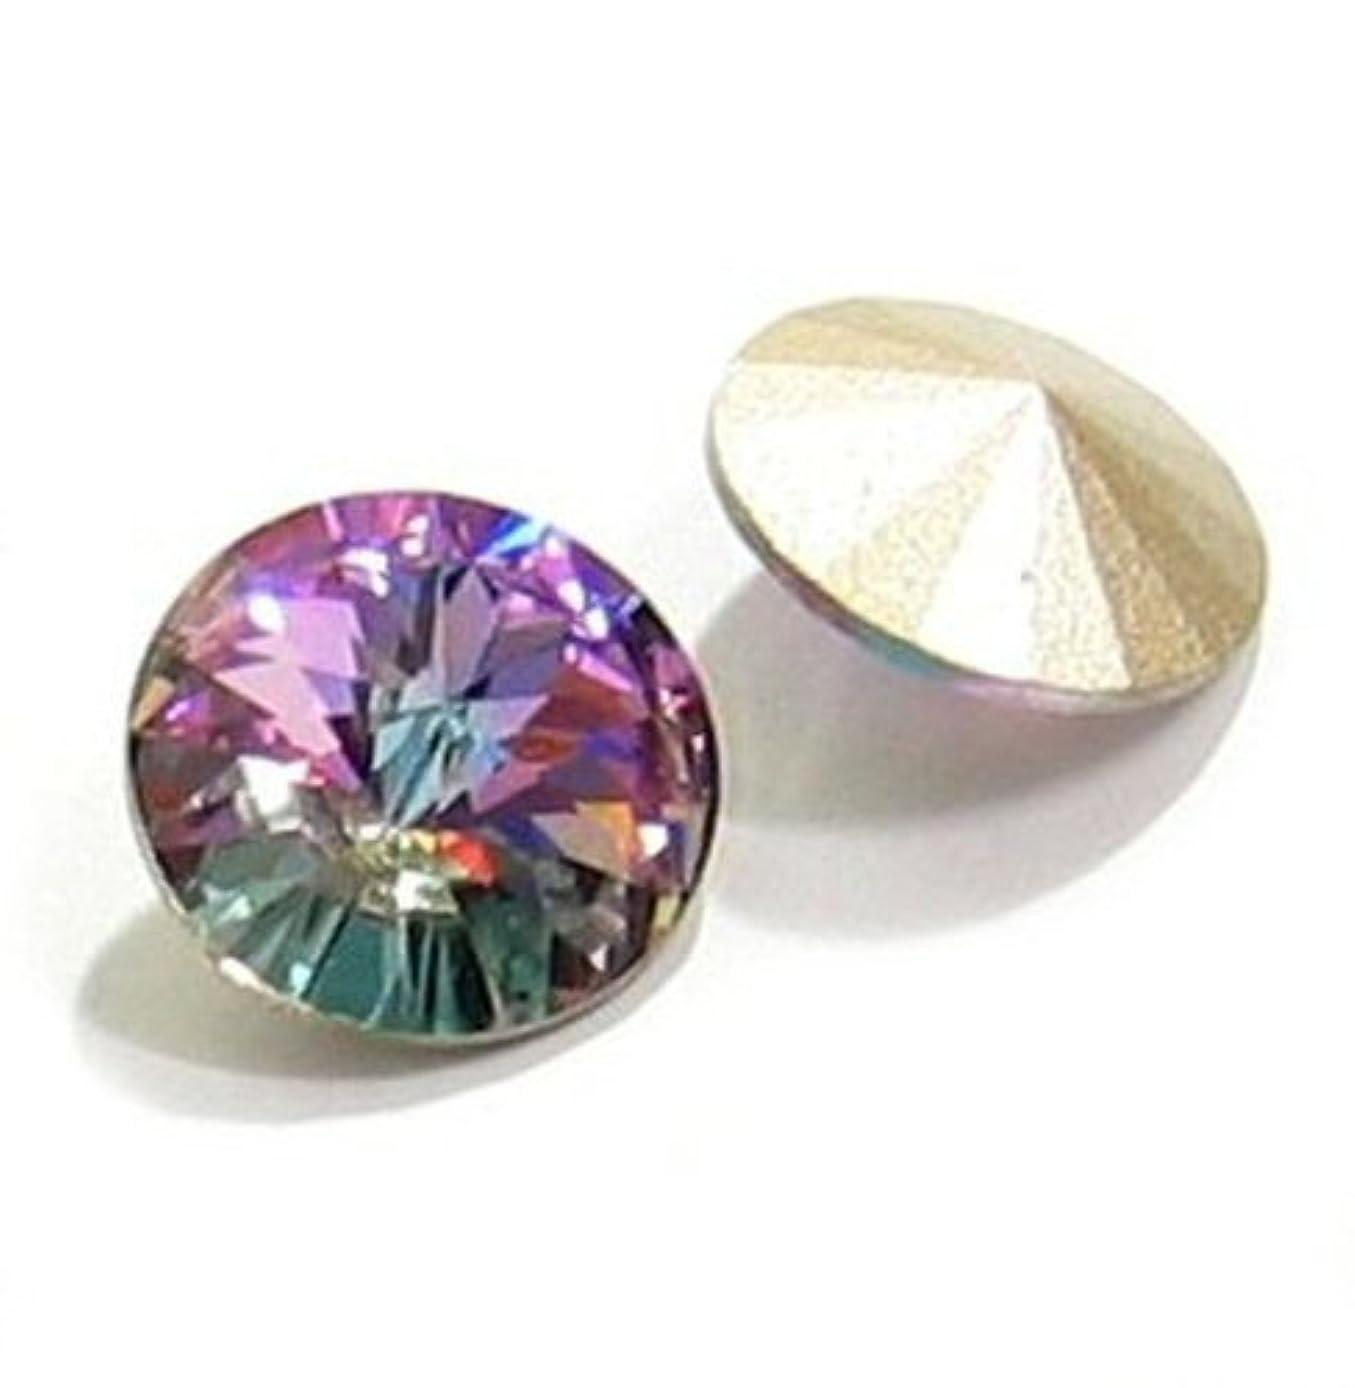 2 pcs Swarovski 1122 Crystal Round Rivoli Stone Silver Foiled Vitrail Light 14mm / Findings / Crystallized Element